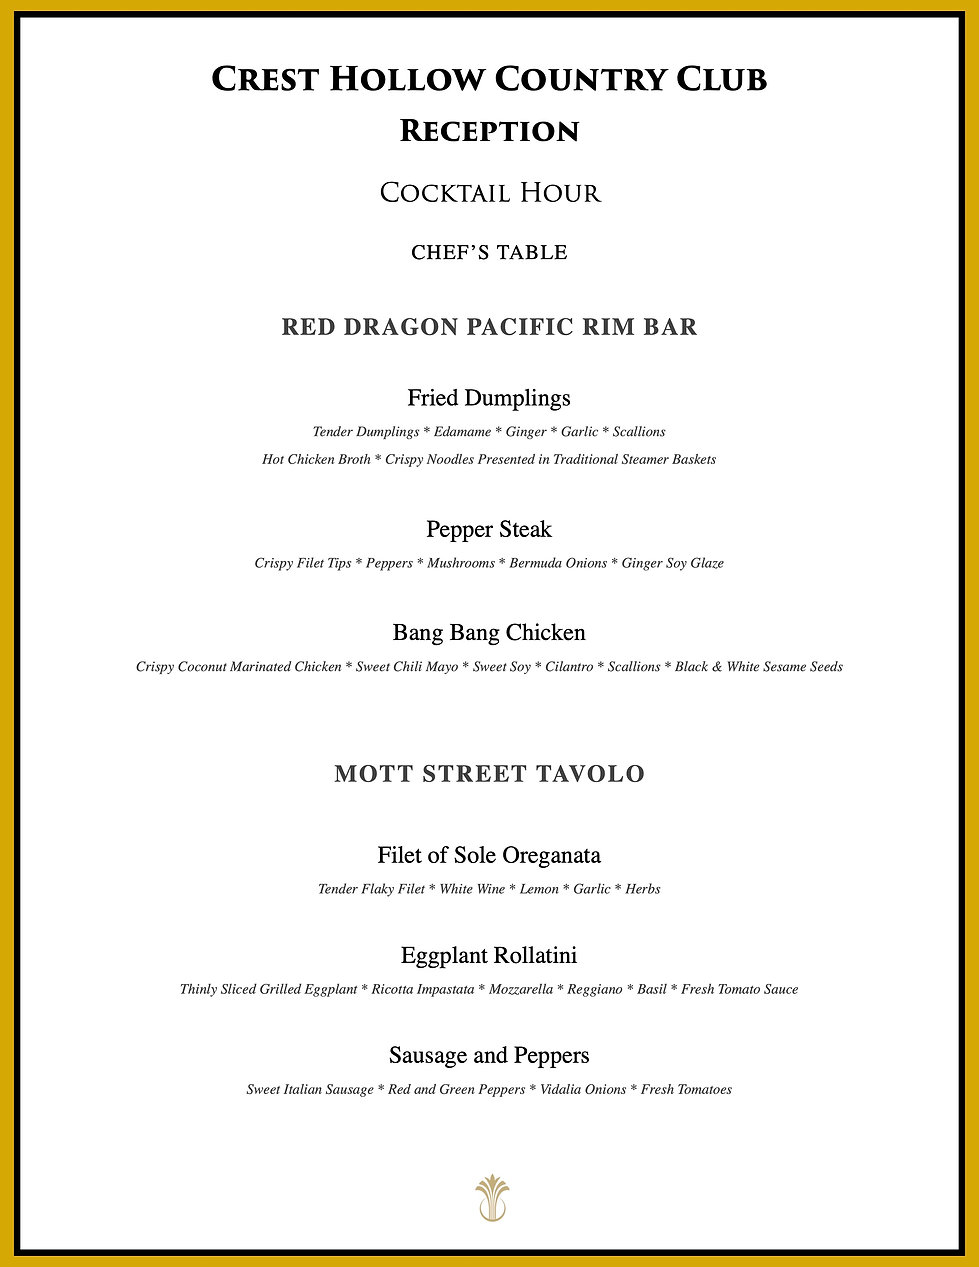 Reception Menu - Page 4.jpg